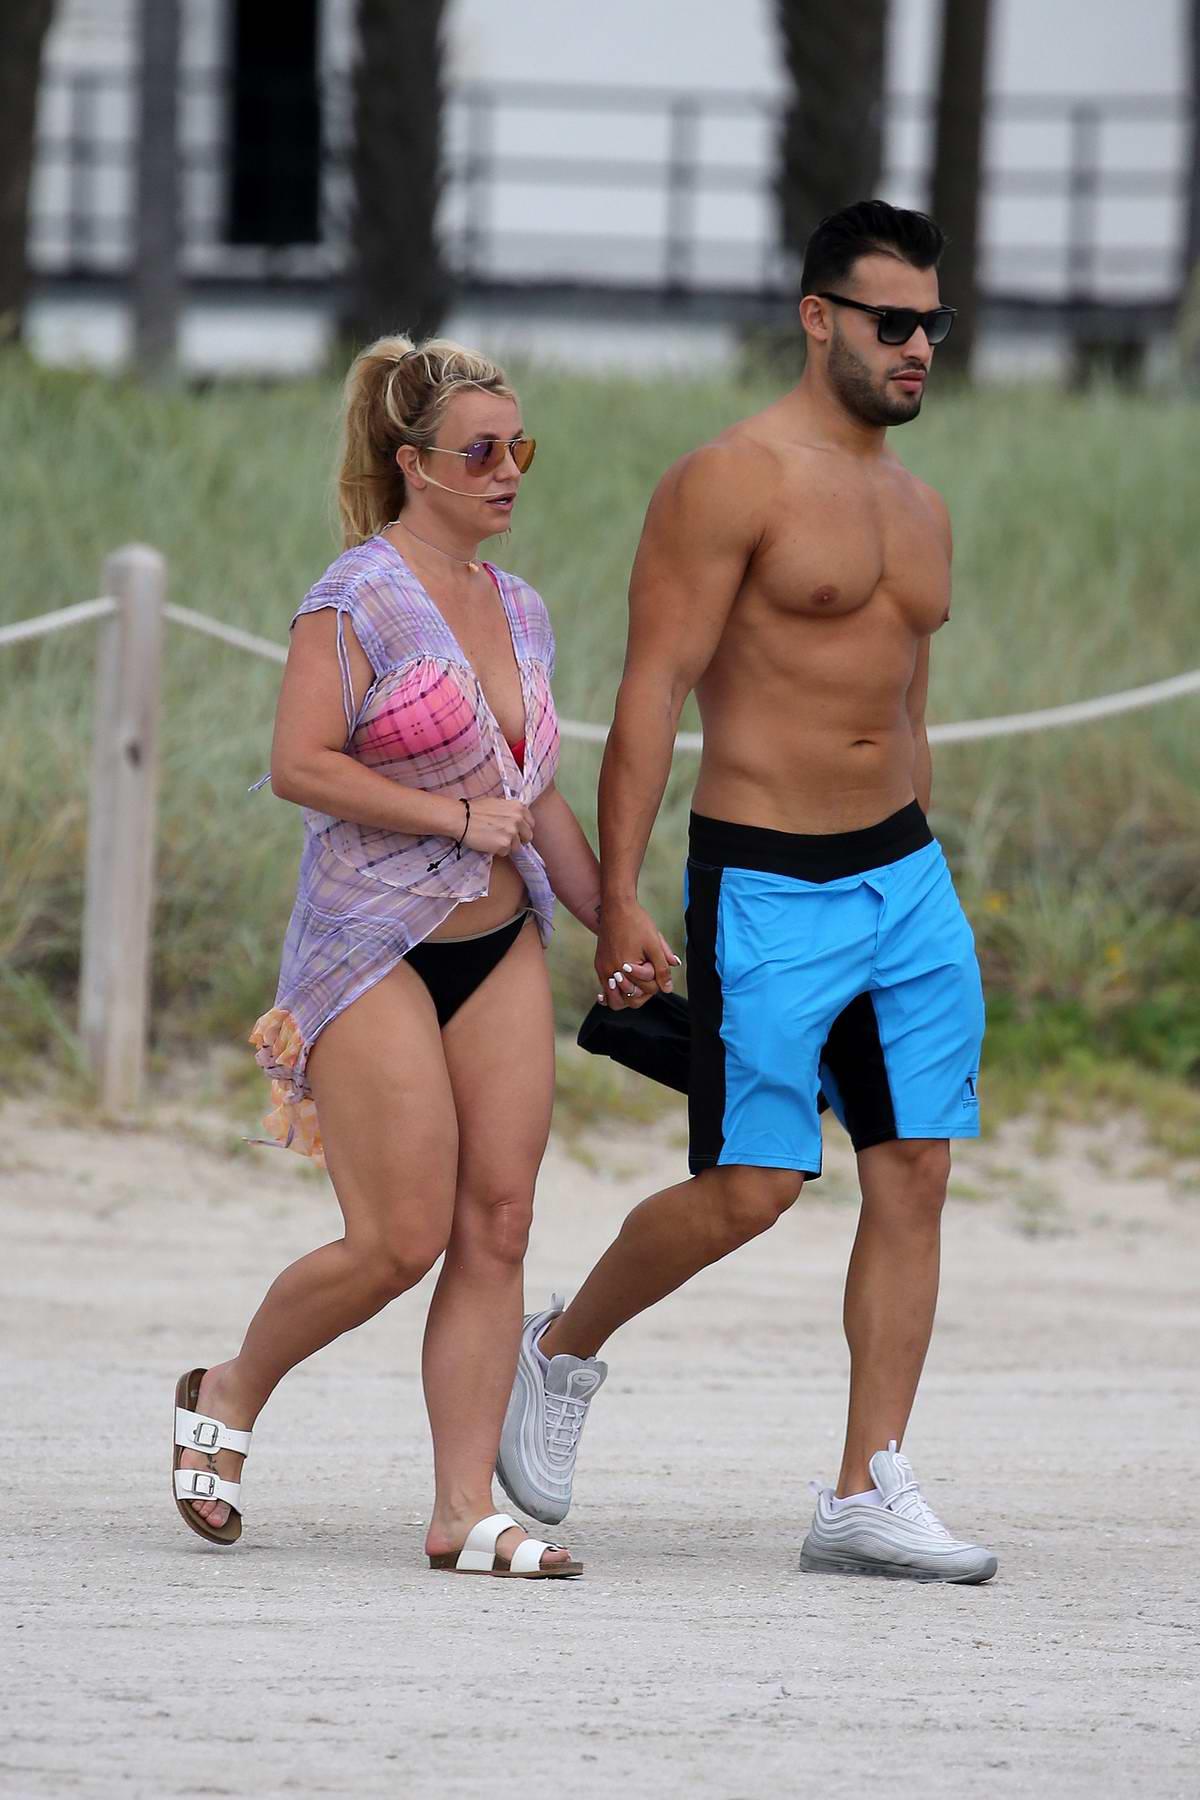 Britney Spears takes a jet ski ride while enjoying a beach day with boyfriend Sam Asghari in Miami, Florida